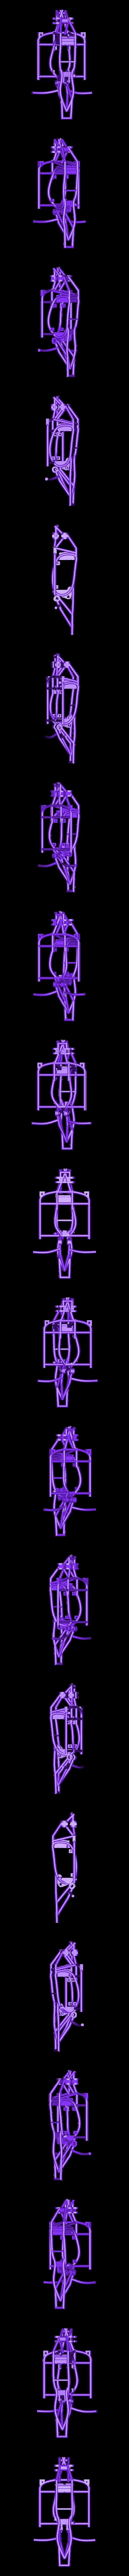 test frame.stl Download free STL file quad (custom) • 3D printing design, jasperbaudoin